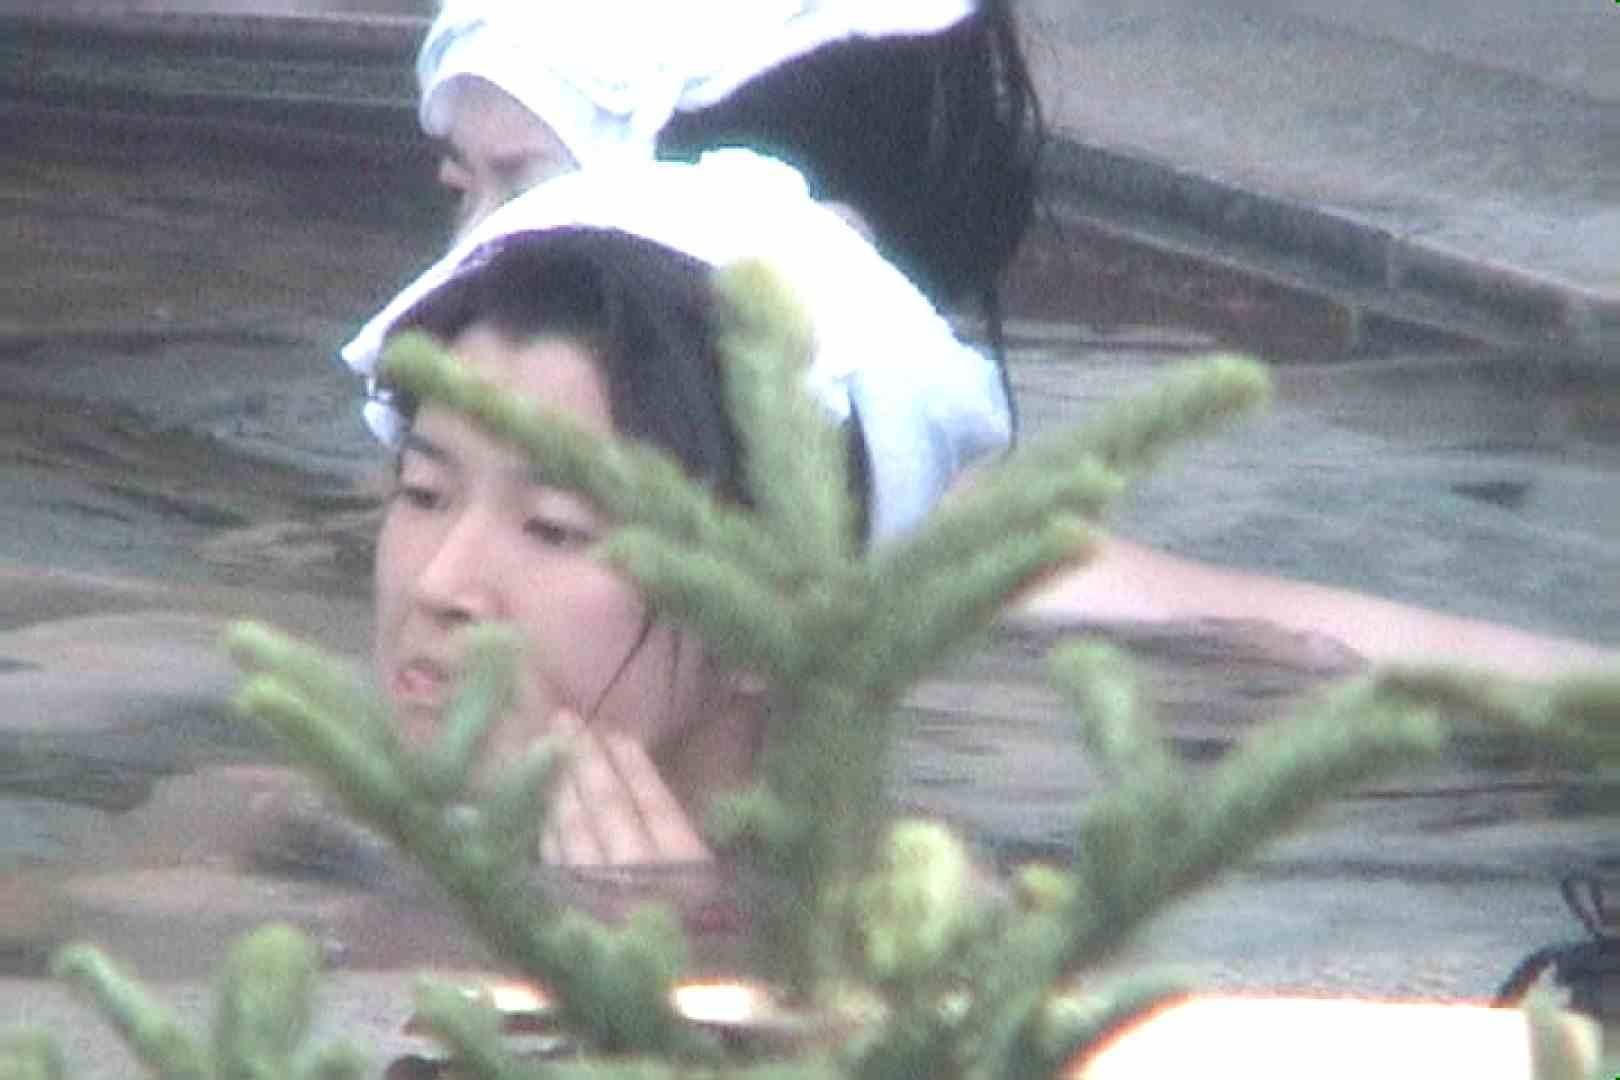 Aquaな露天風呂Vol.80【VIP限定】 盗撮 | HなOL  66pic 65